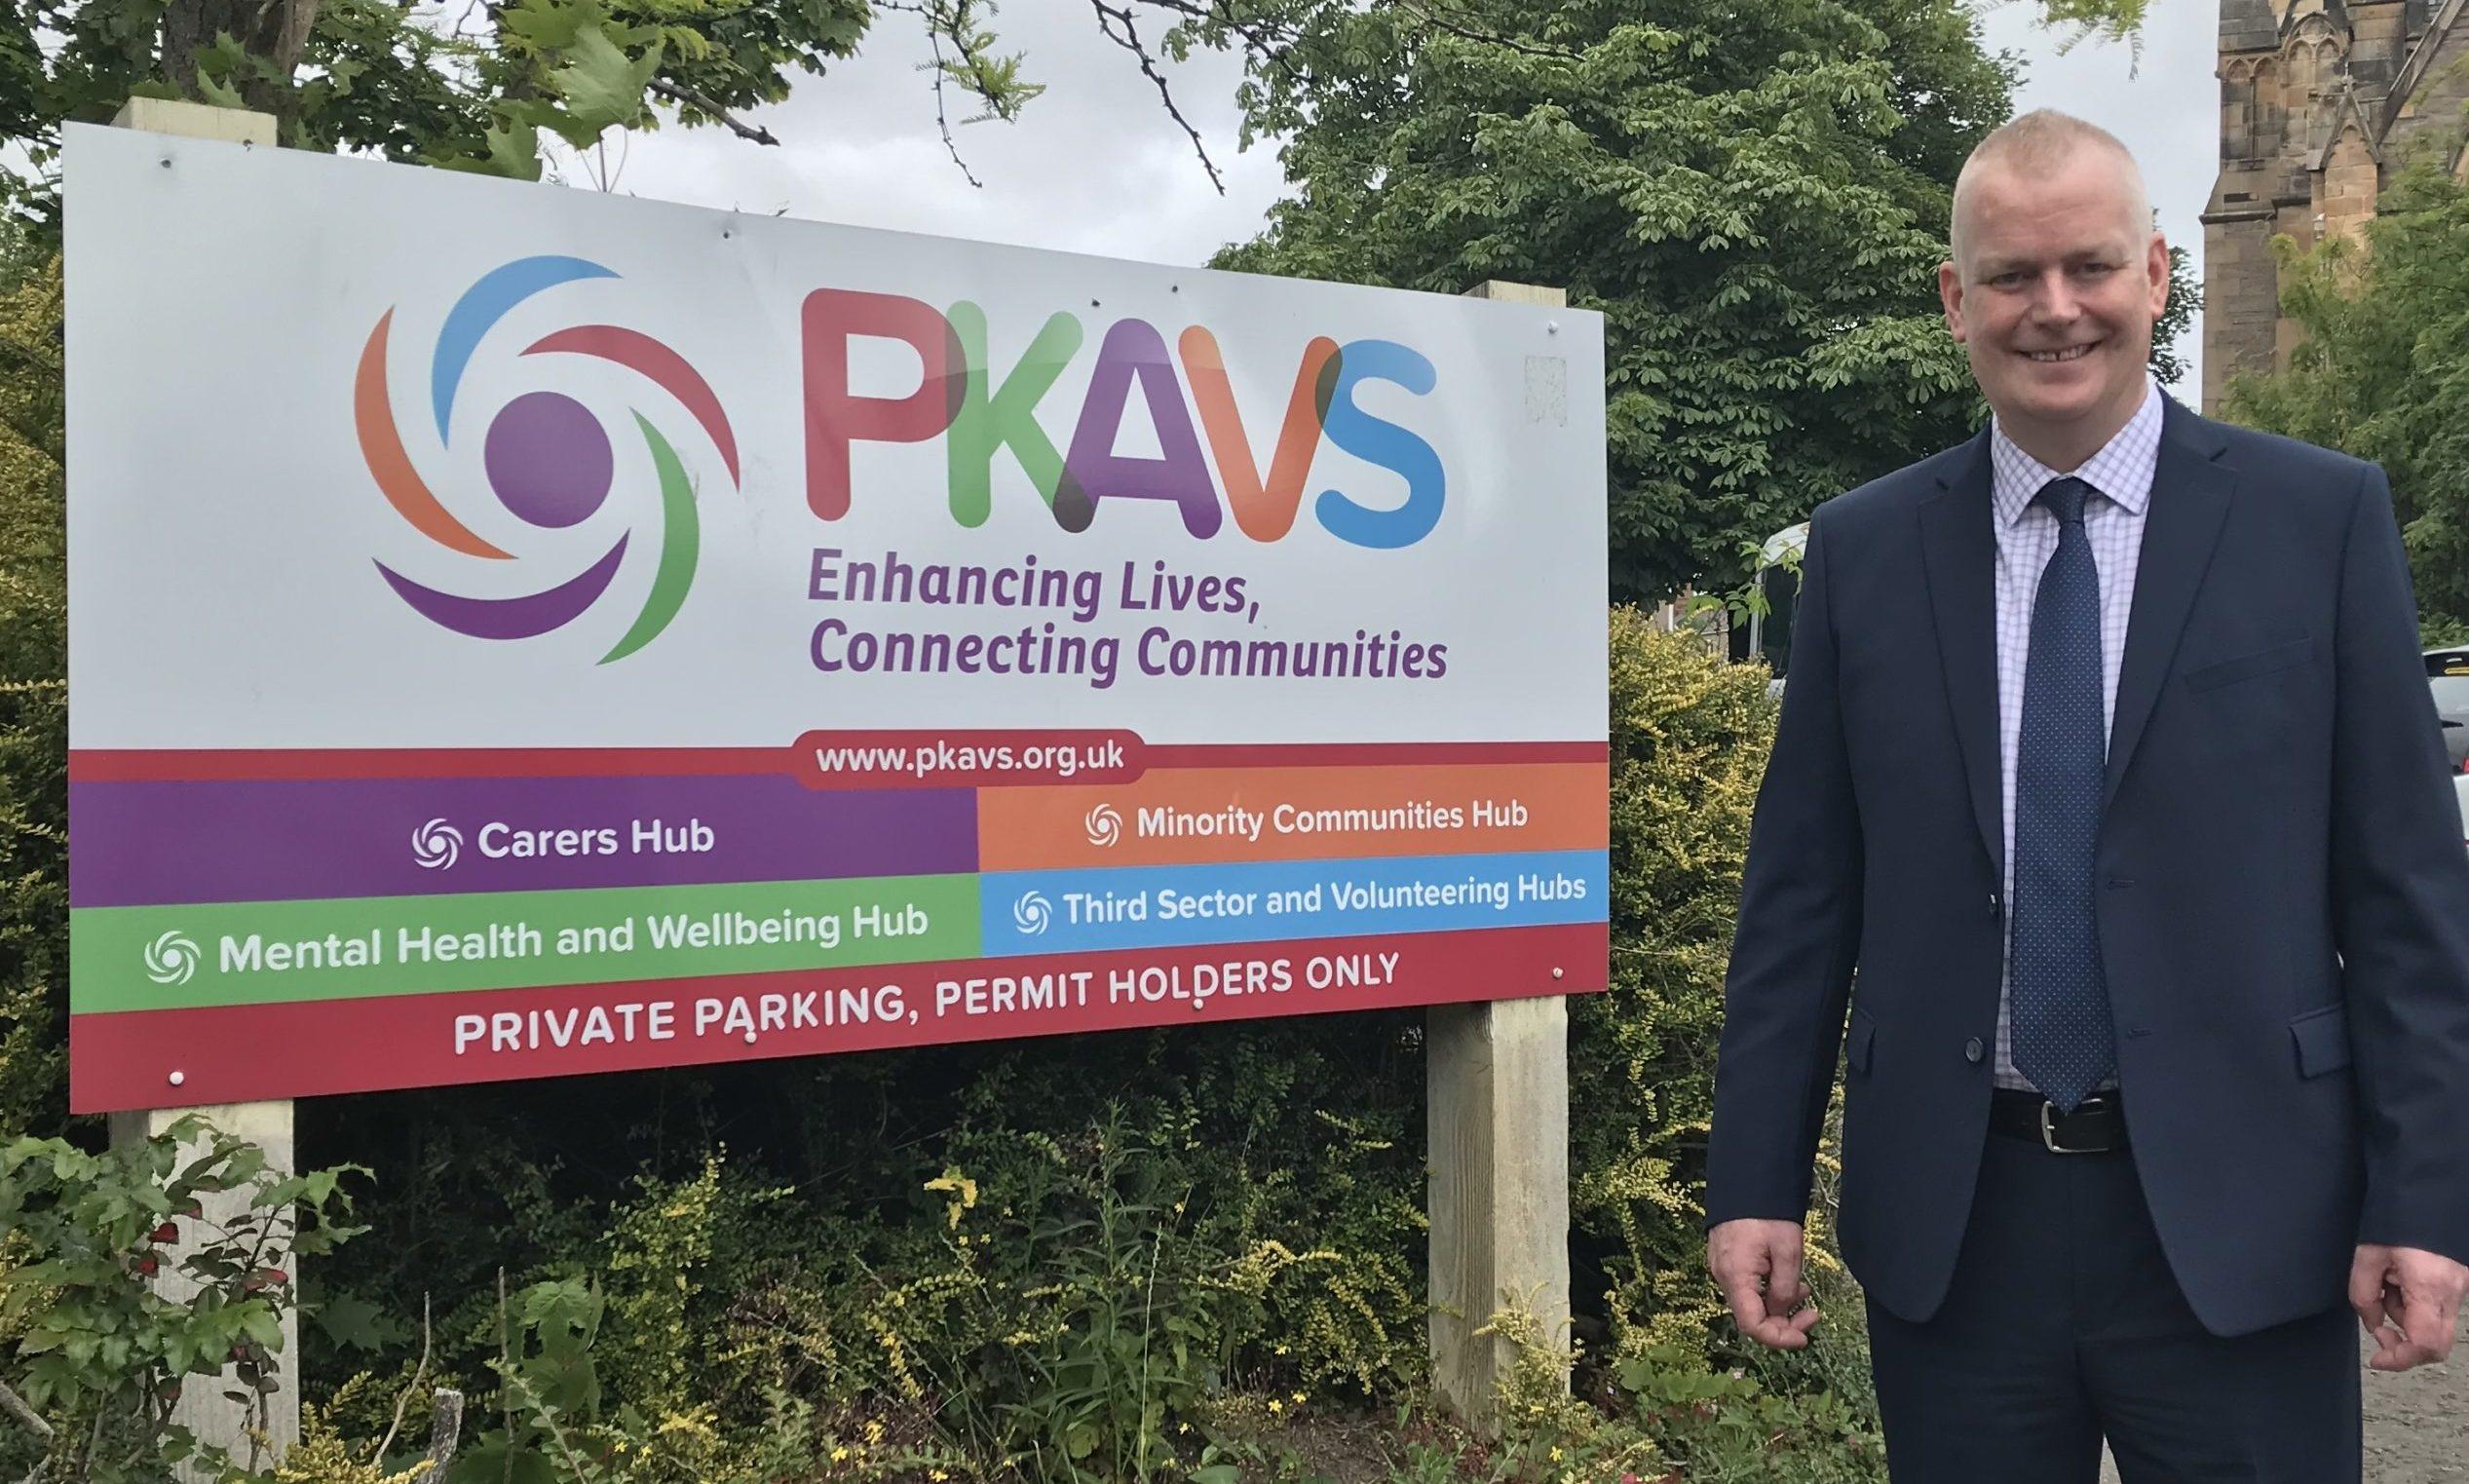 Paul Graham, chief executive of PKAVS